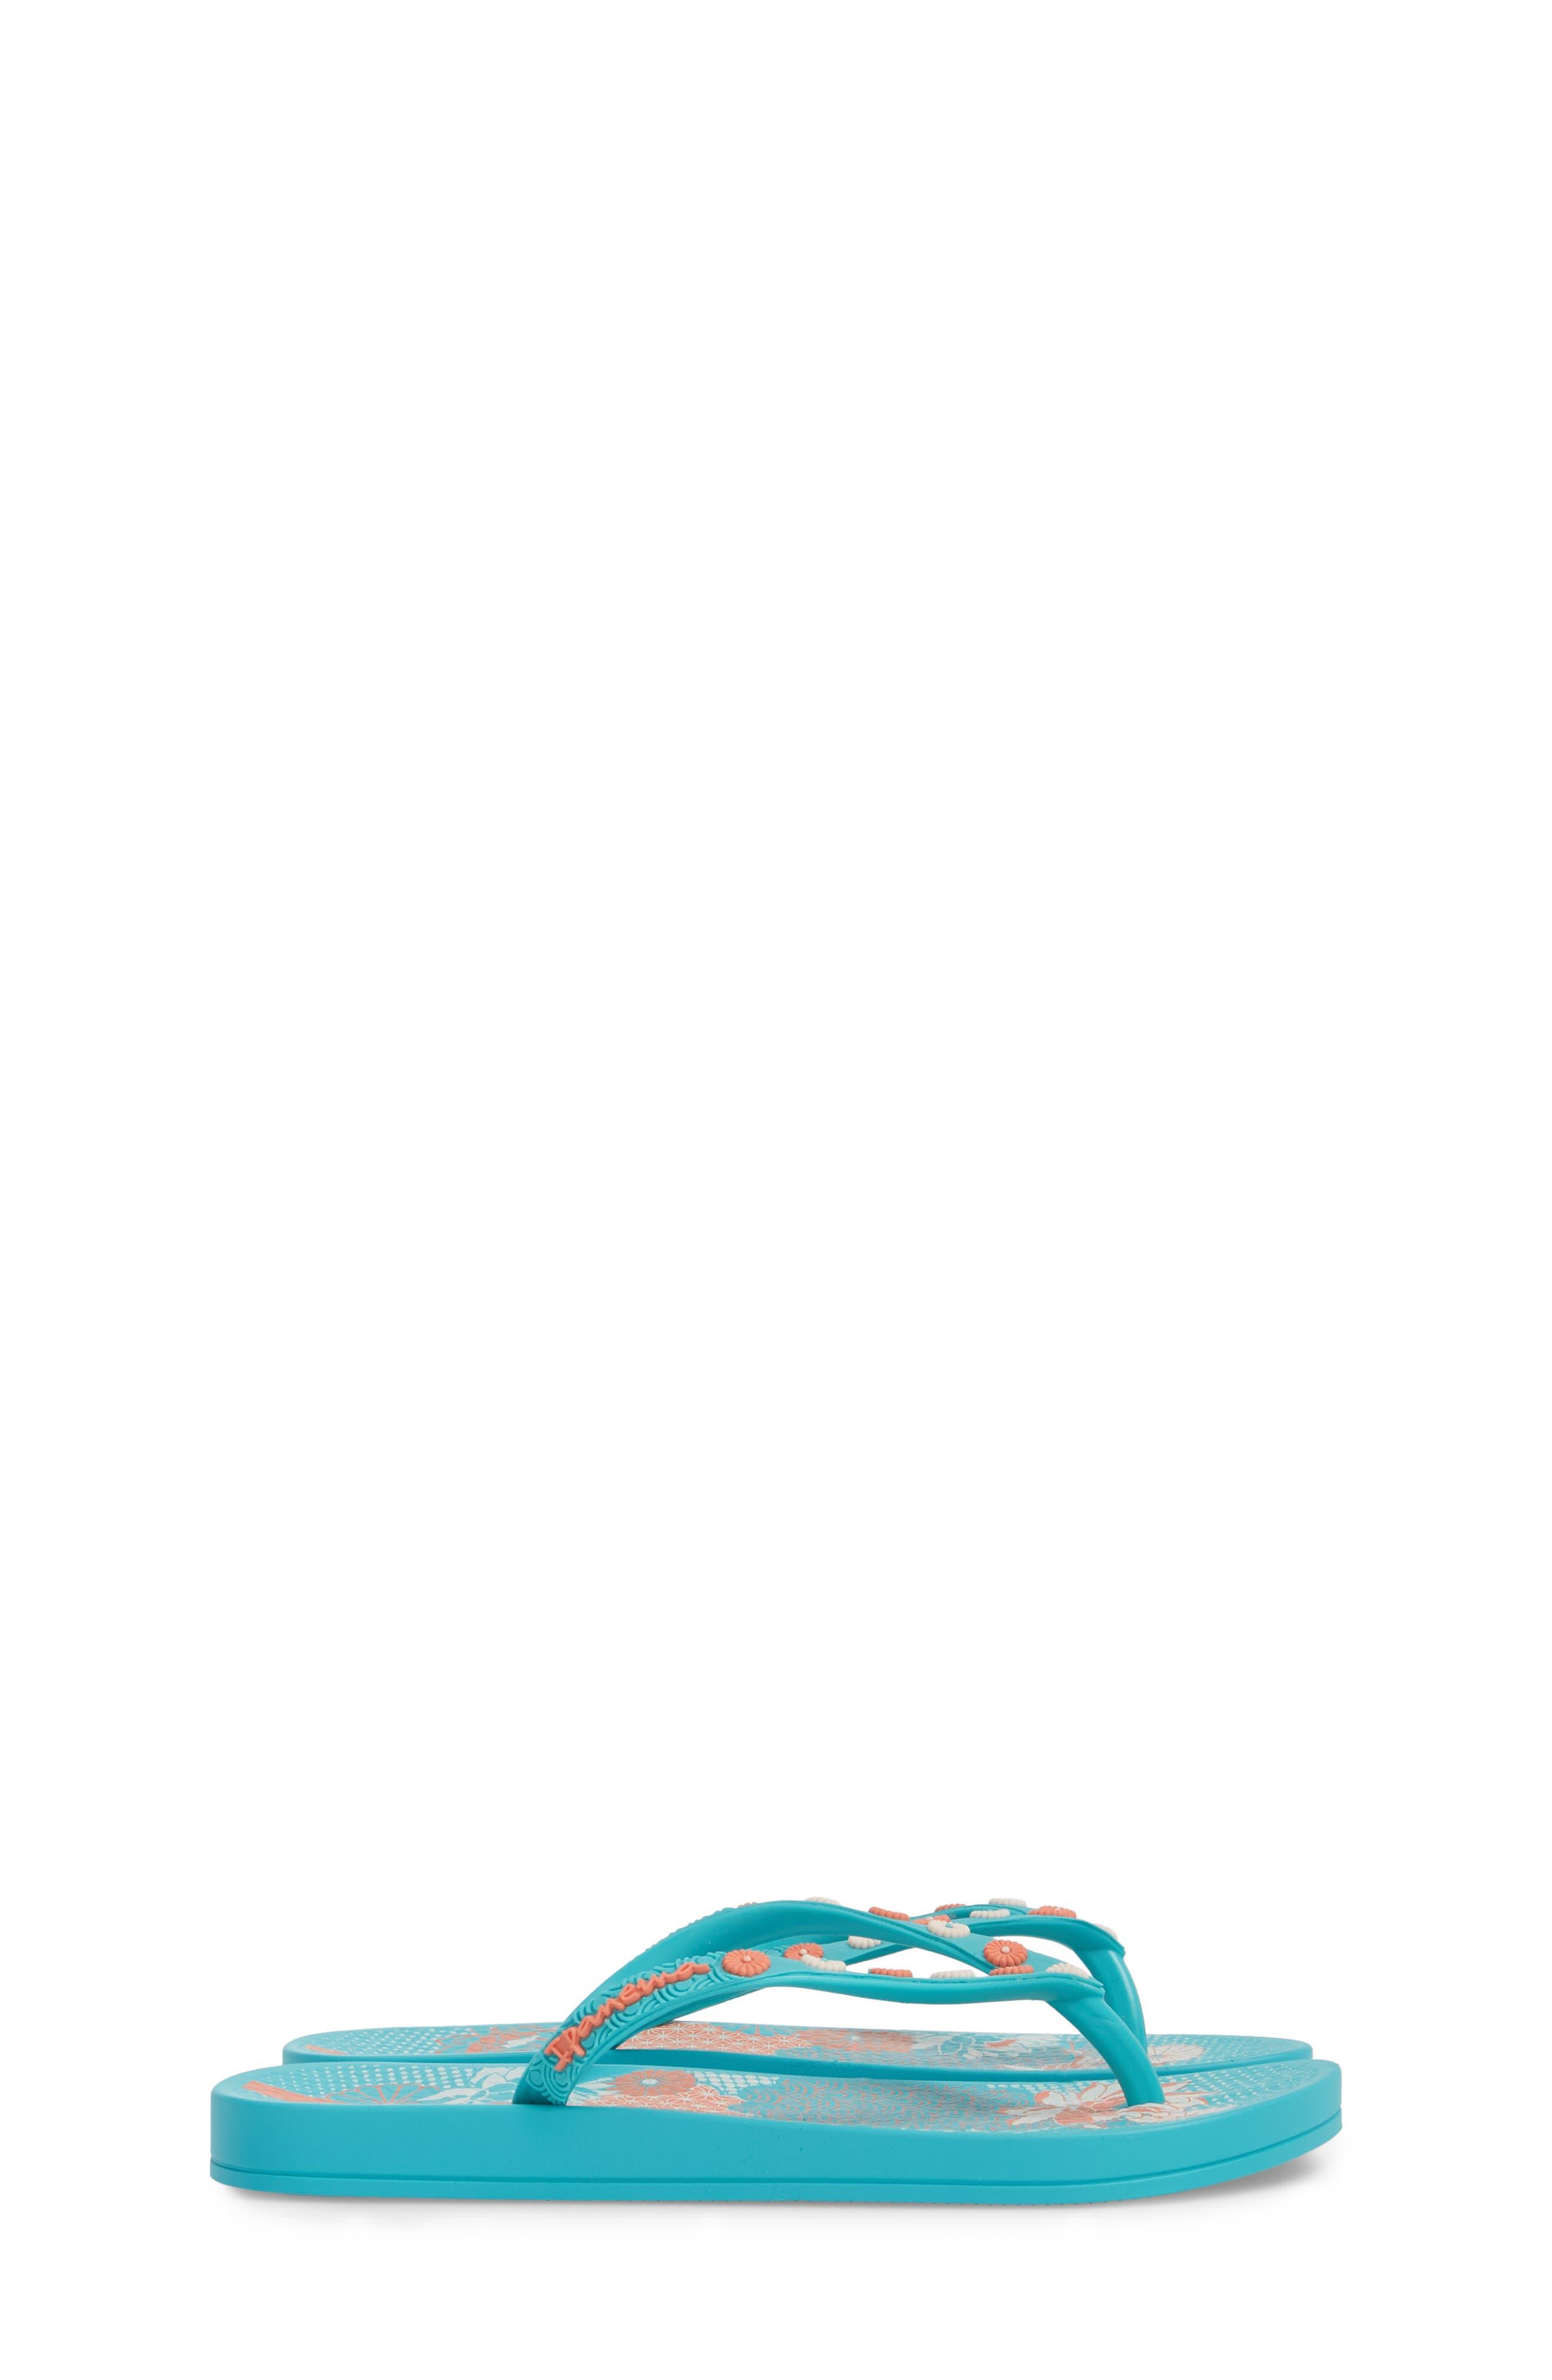 Ana Lovely Flip Flop,                             Alternate thumbnail 4, color,                             Blue